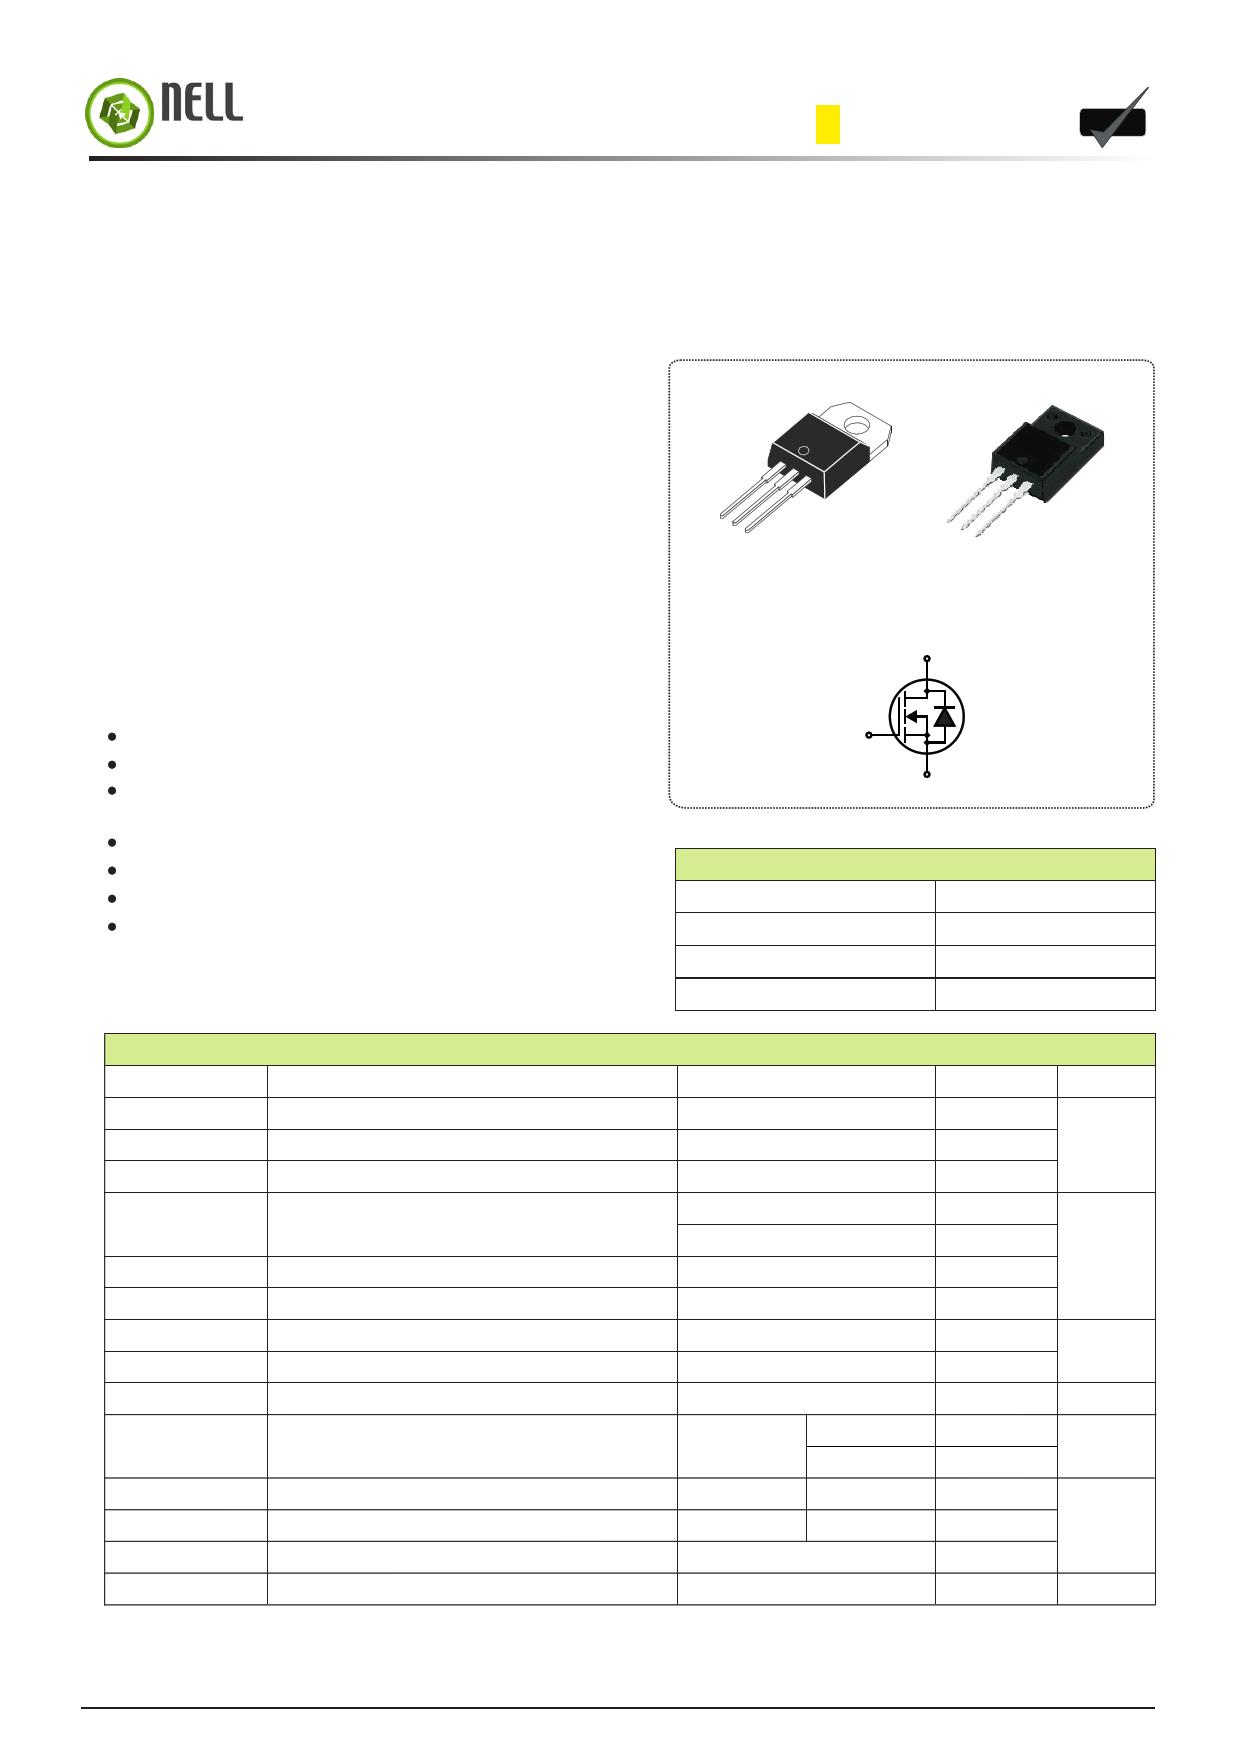 I2N65 datasheet